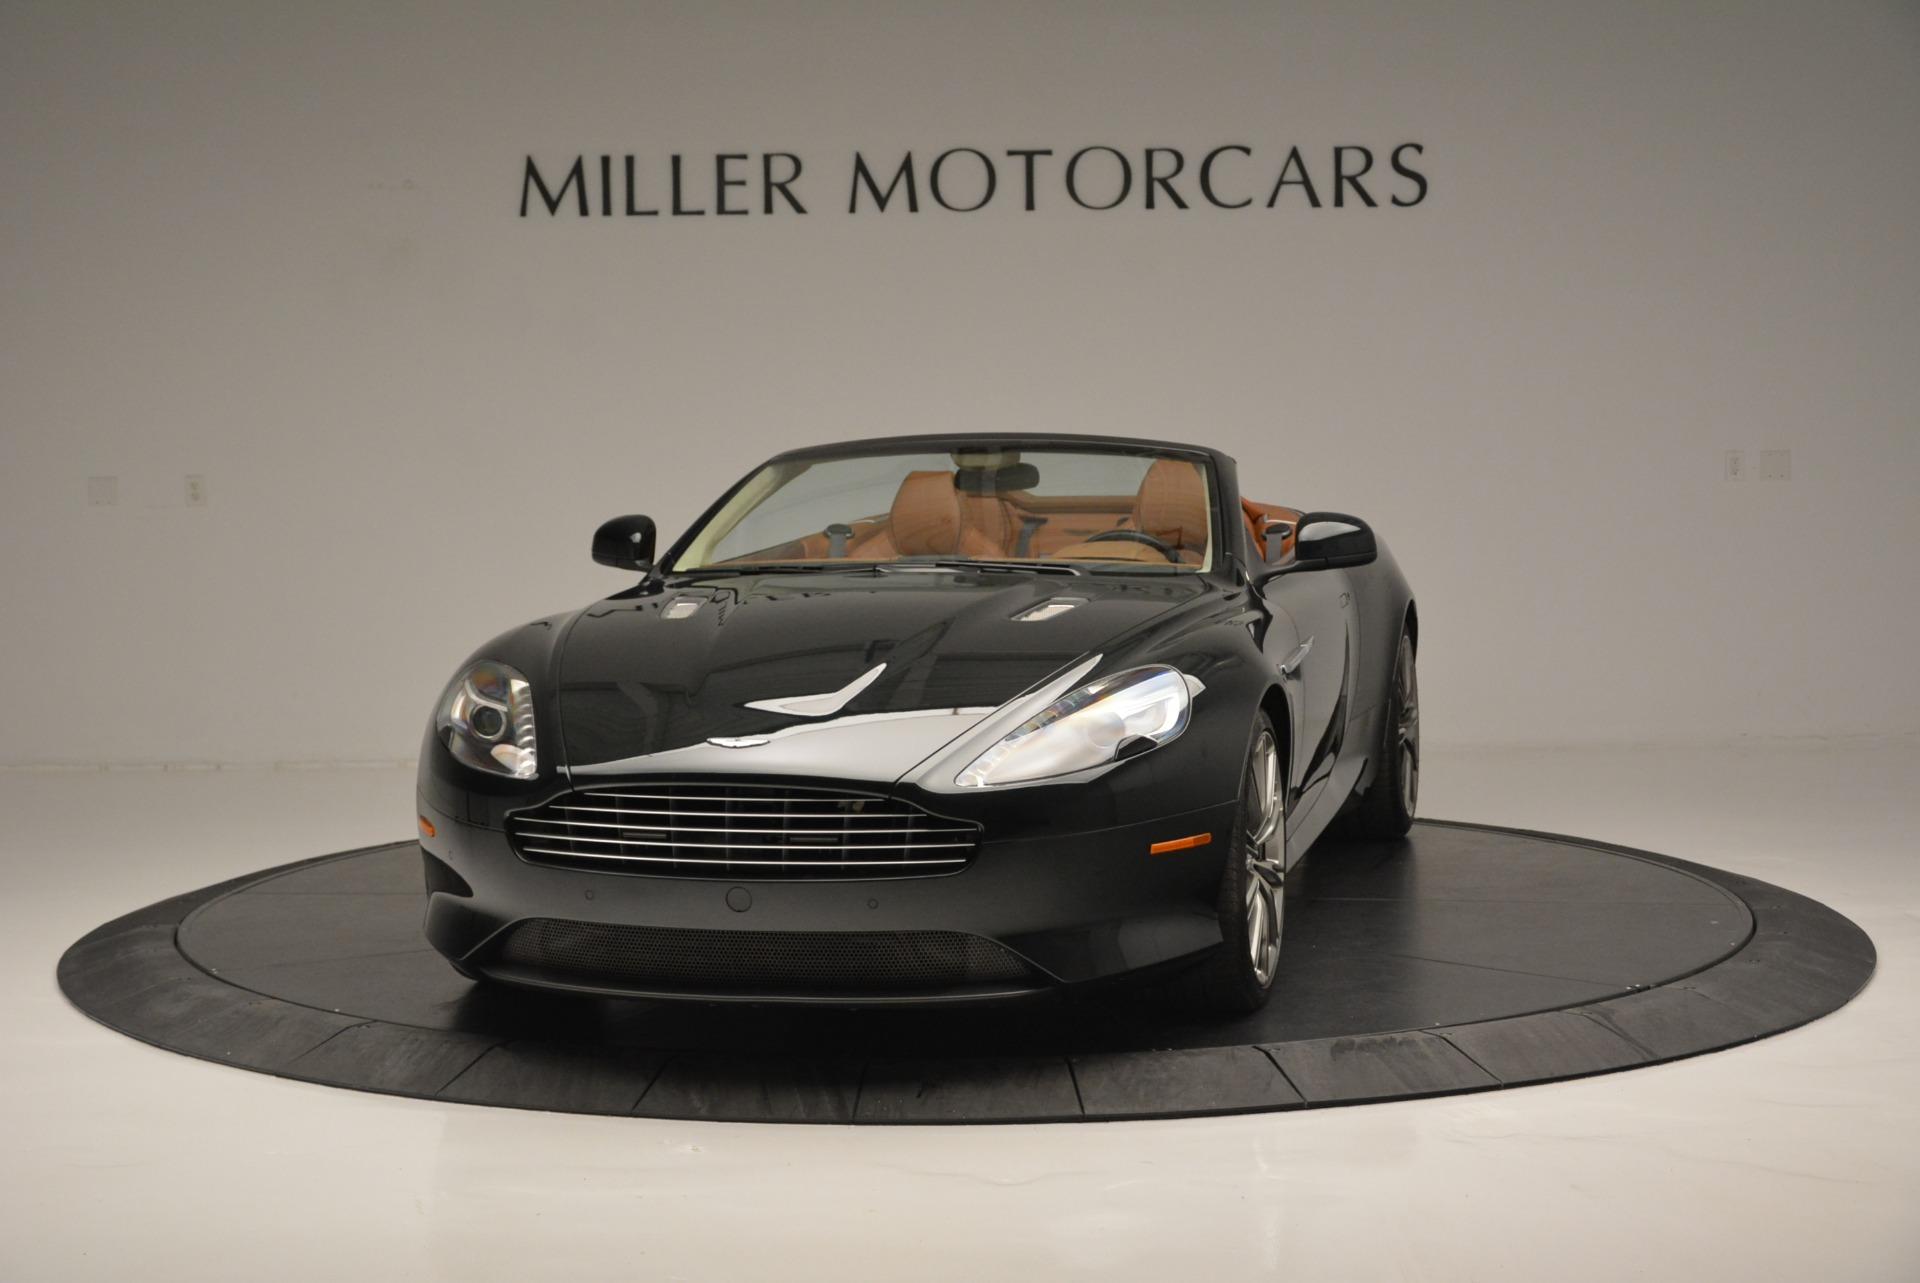 Used 2012 Aston Martin Virage Volante for sale Sold at Maserati of Greenwich in Greenwich CT 06830 1